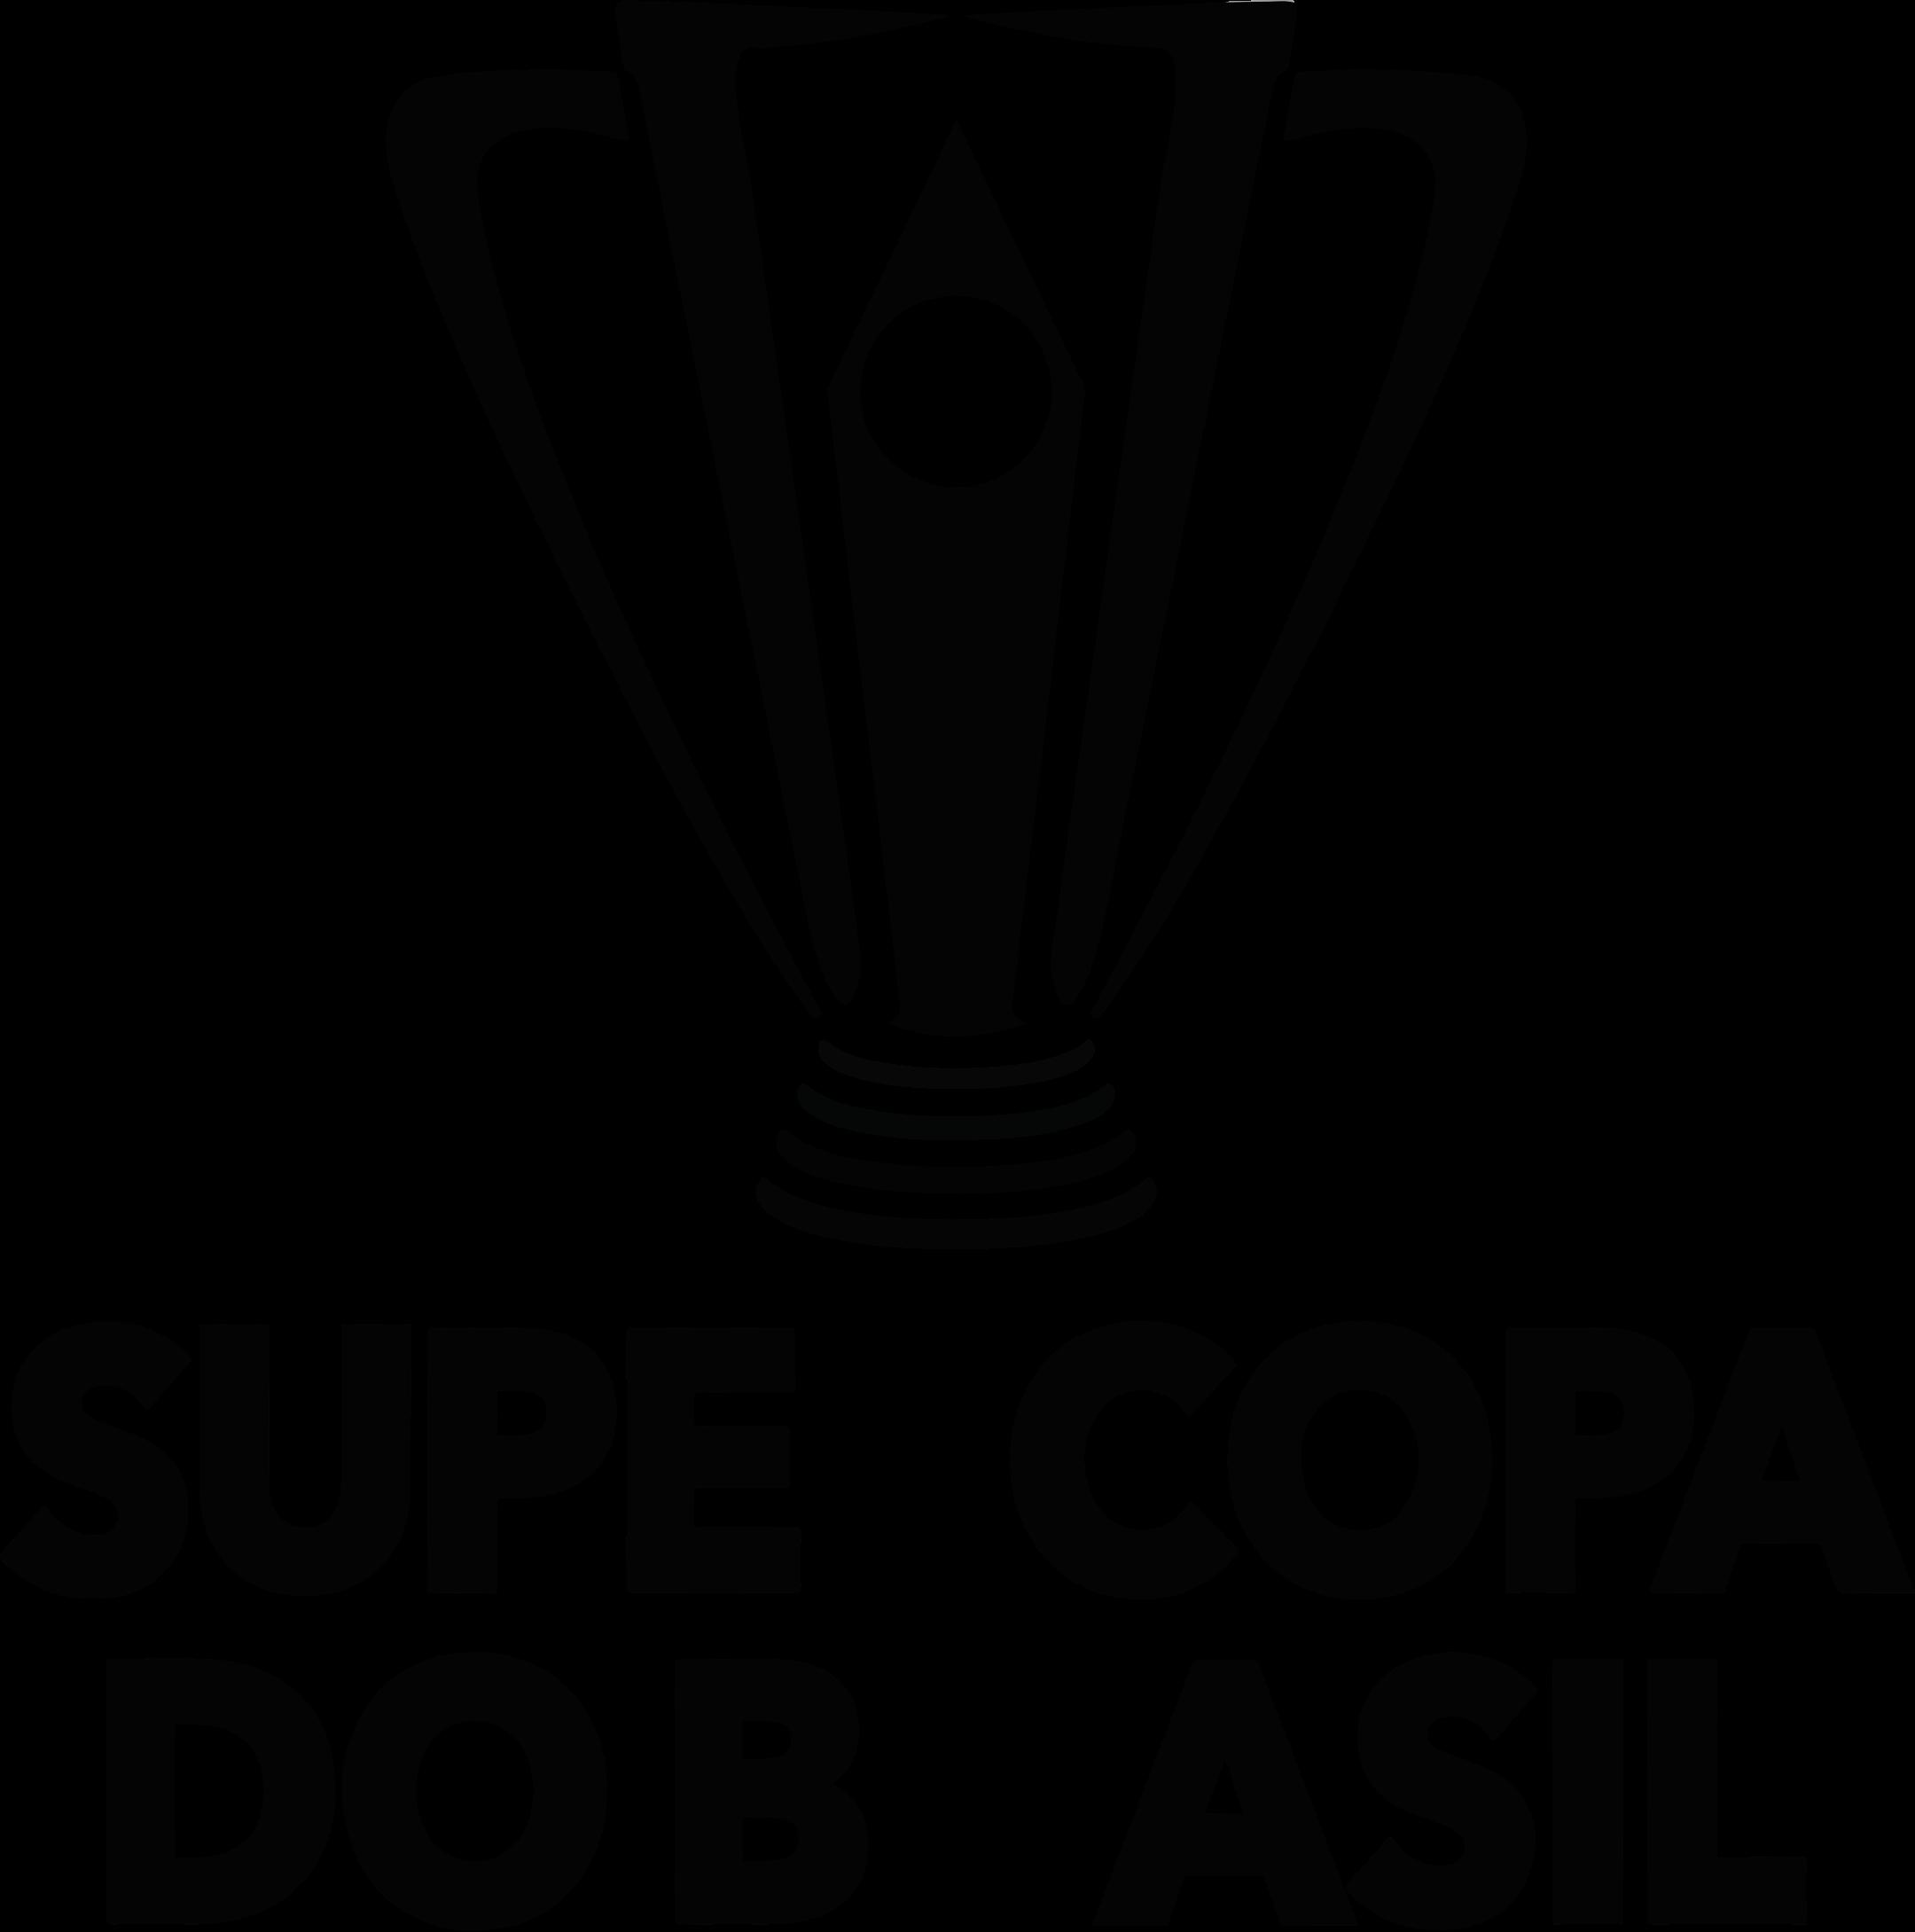 supercopa do brasil logo 1 - Supercopa Do Brasil Logo